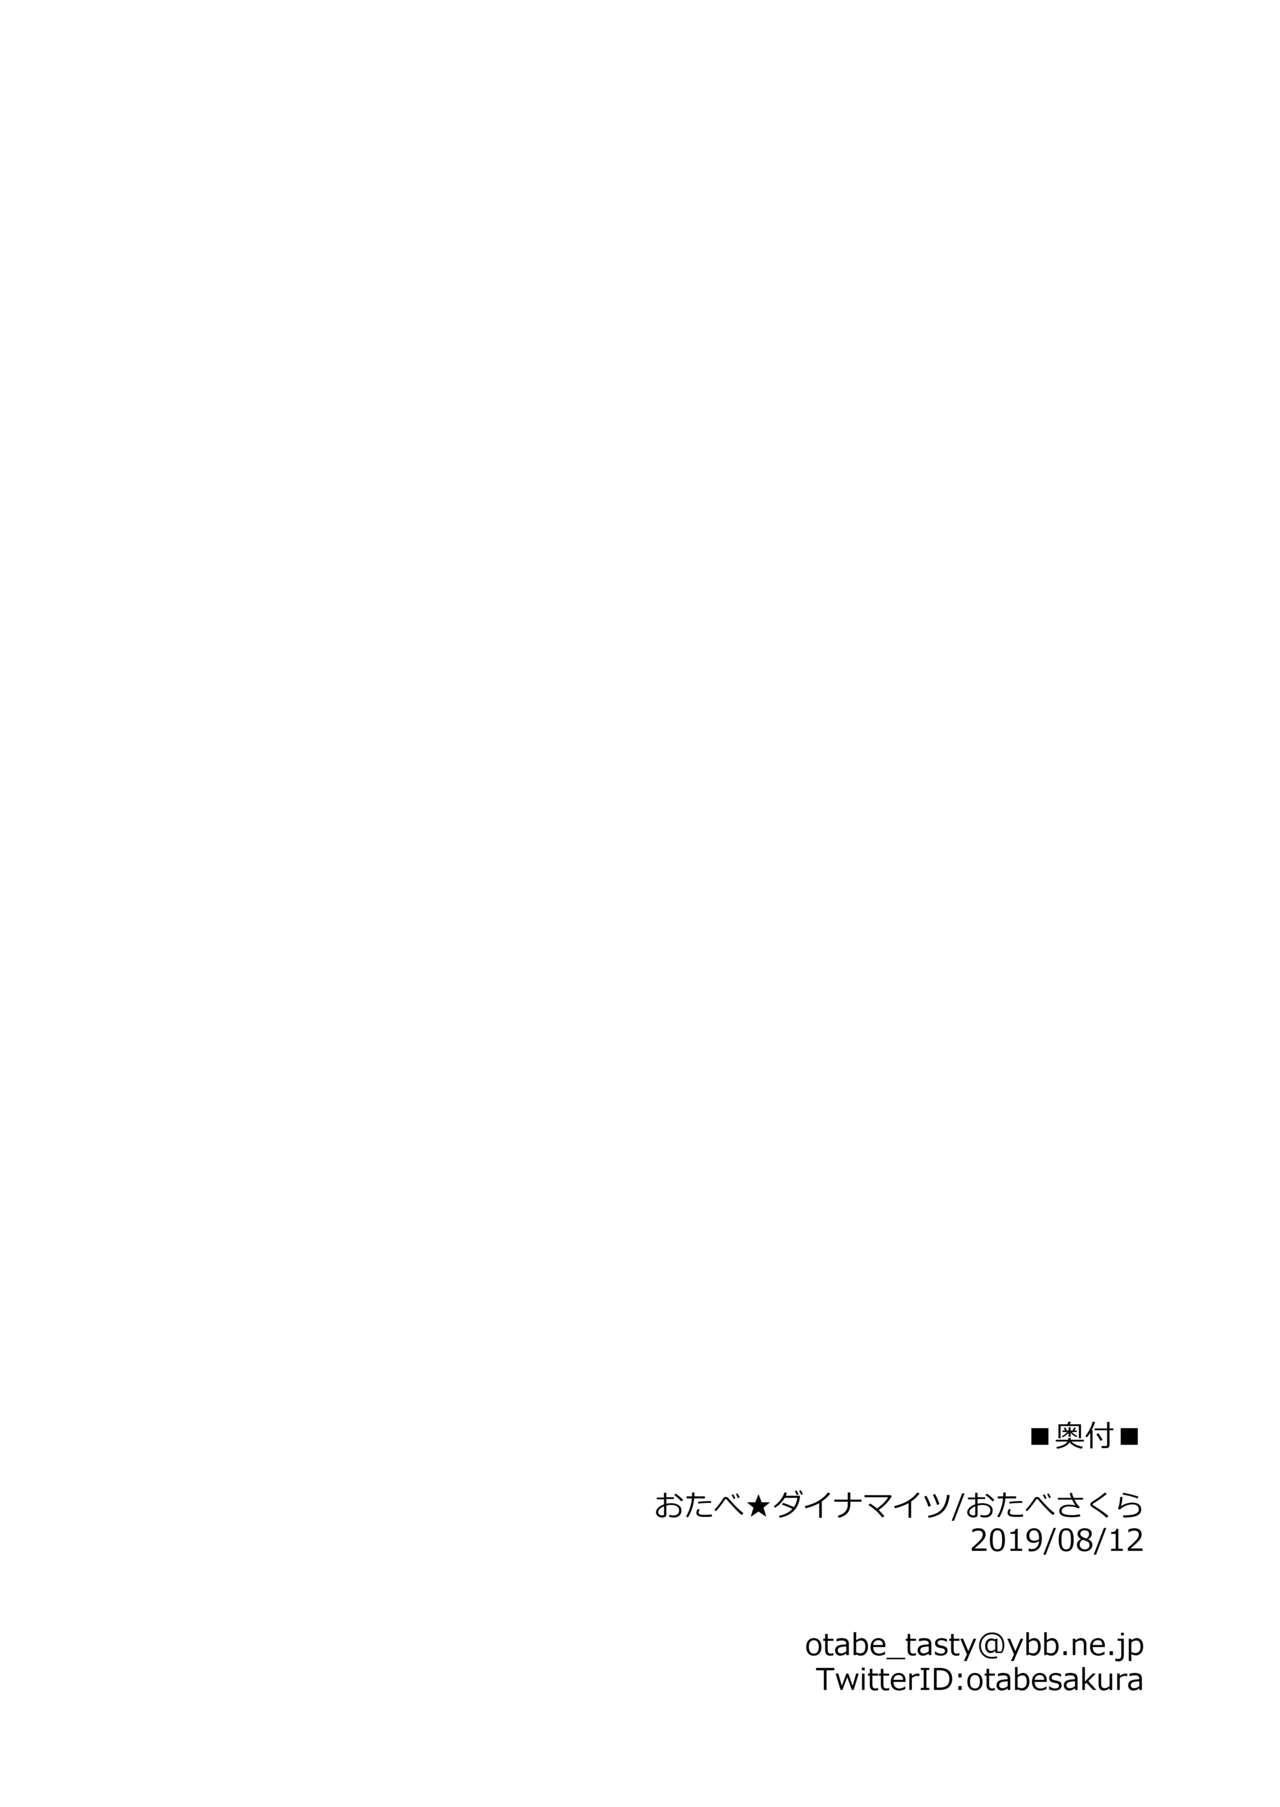 [Otabe Dynamites (Otabe Sakura)] 148cm No Bra & Kyonyuu Therapist to Micchaku H | Close Contact with a 148cm, Big-Boobed & Bra-less Therapist [English] [Confidential TL] [Digital] 25